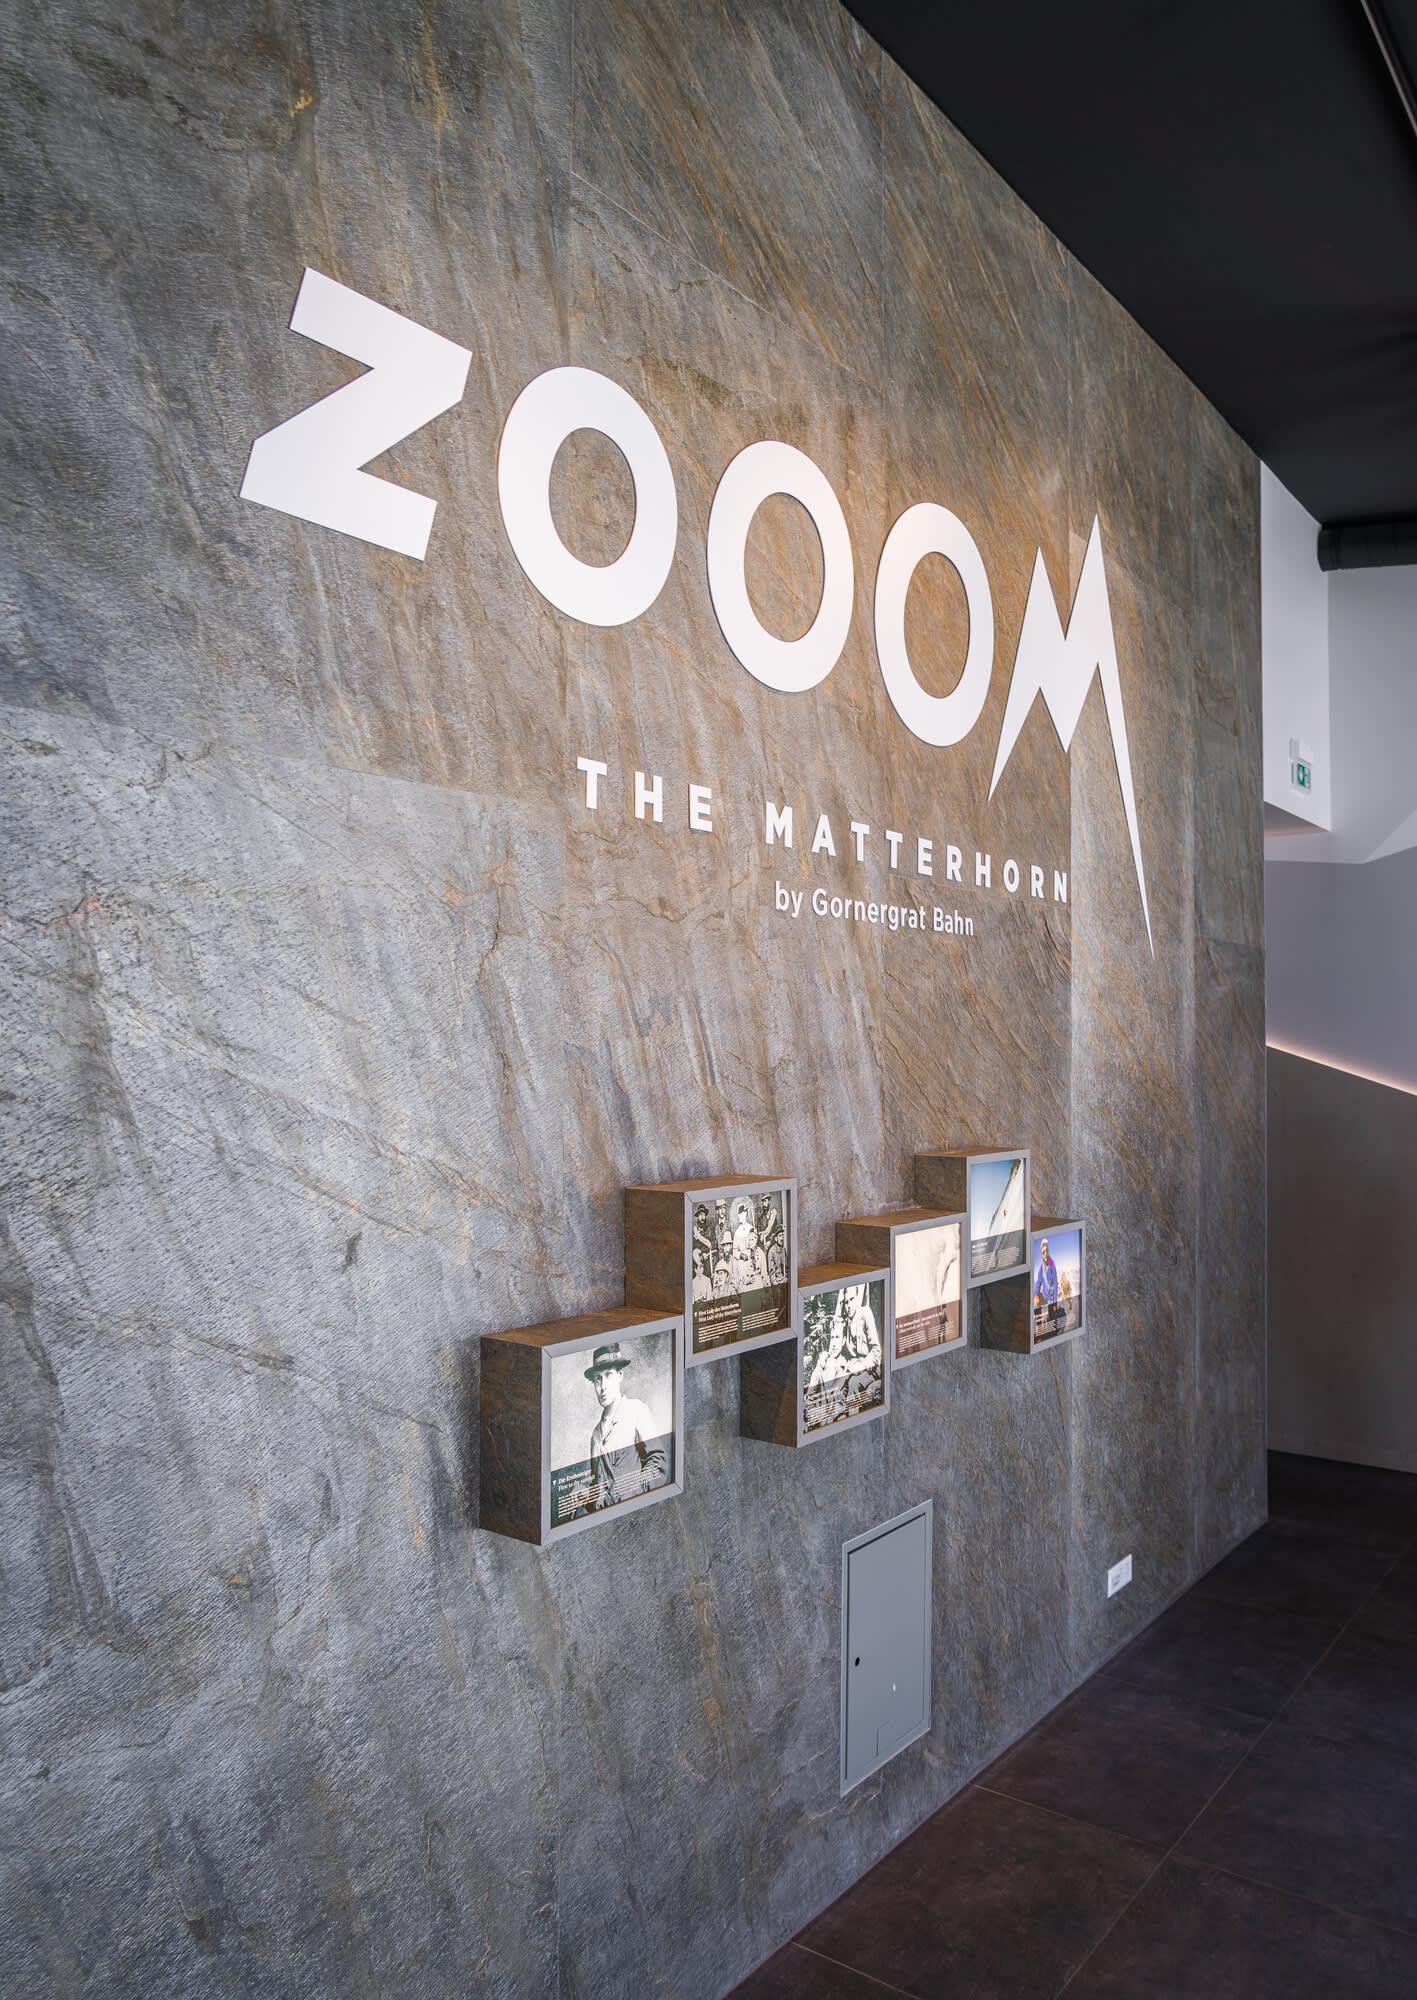 Heroes on the Matterhorn - Zooom the Matterhorn, multimedia experience world on the Gornergrat in Zermatt